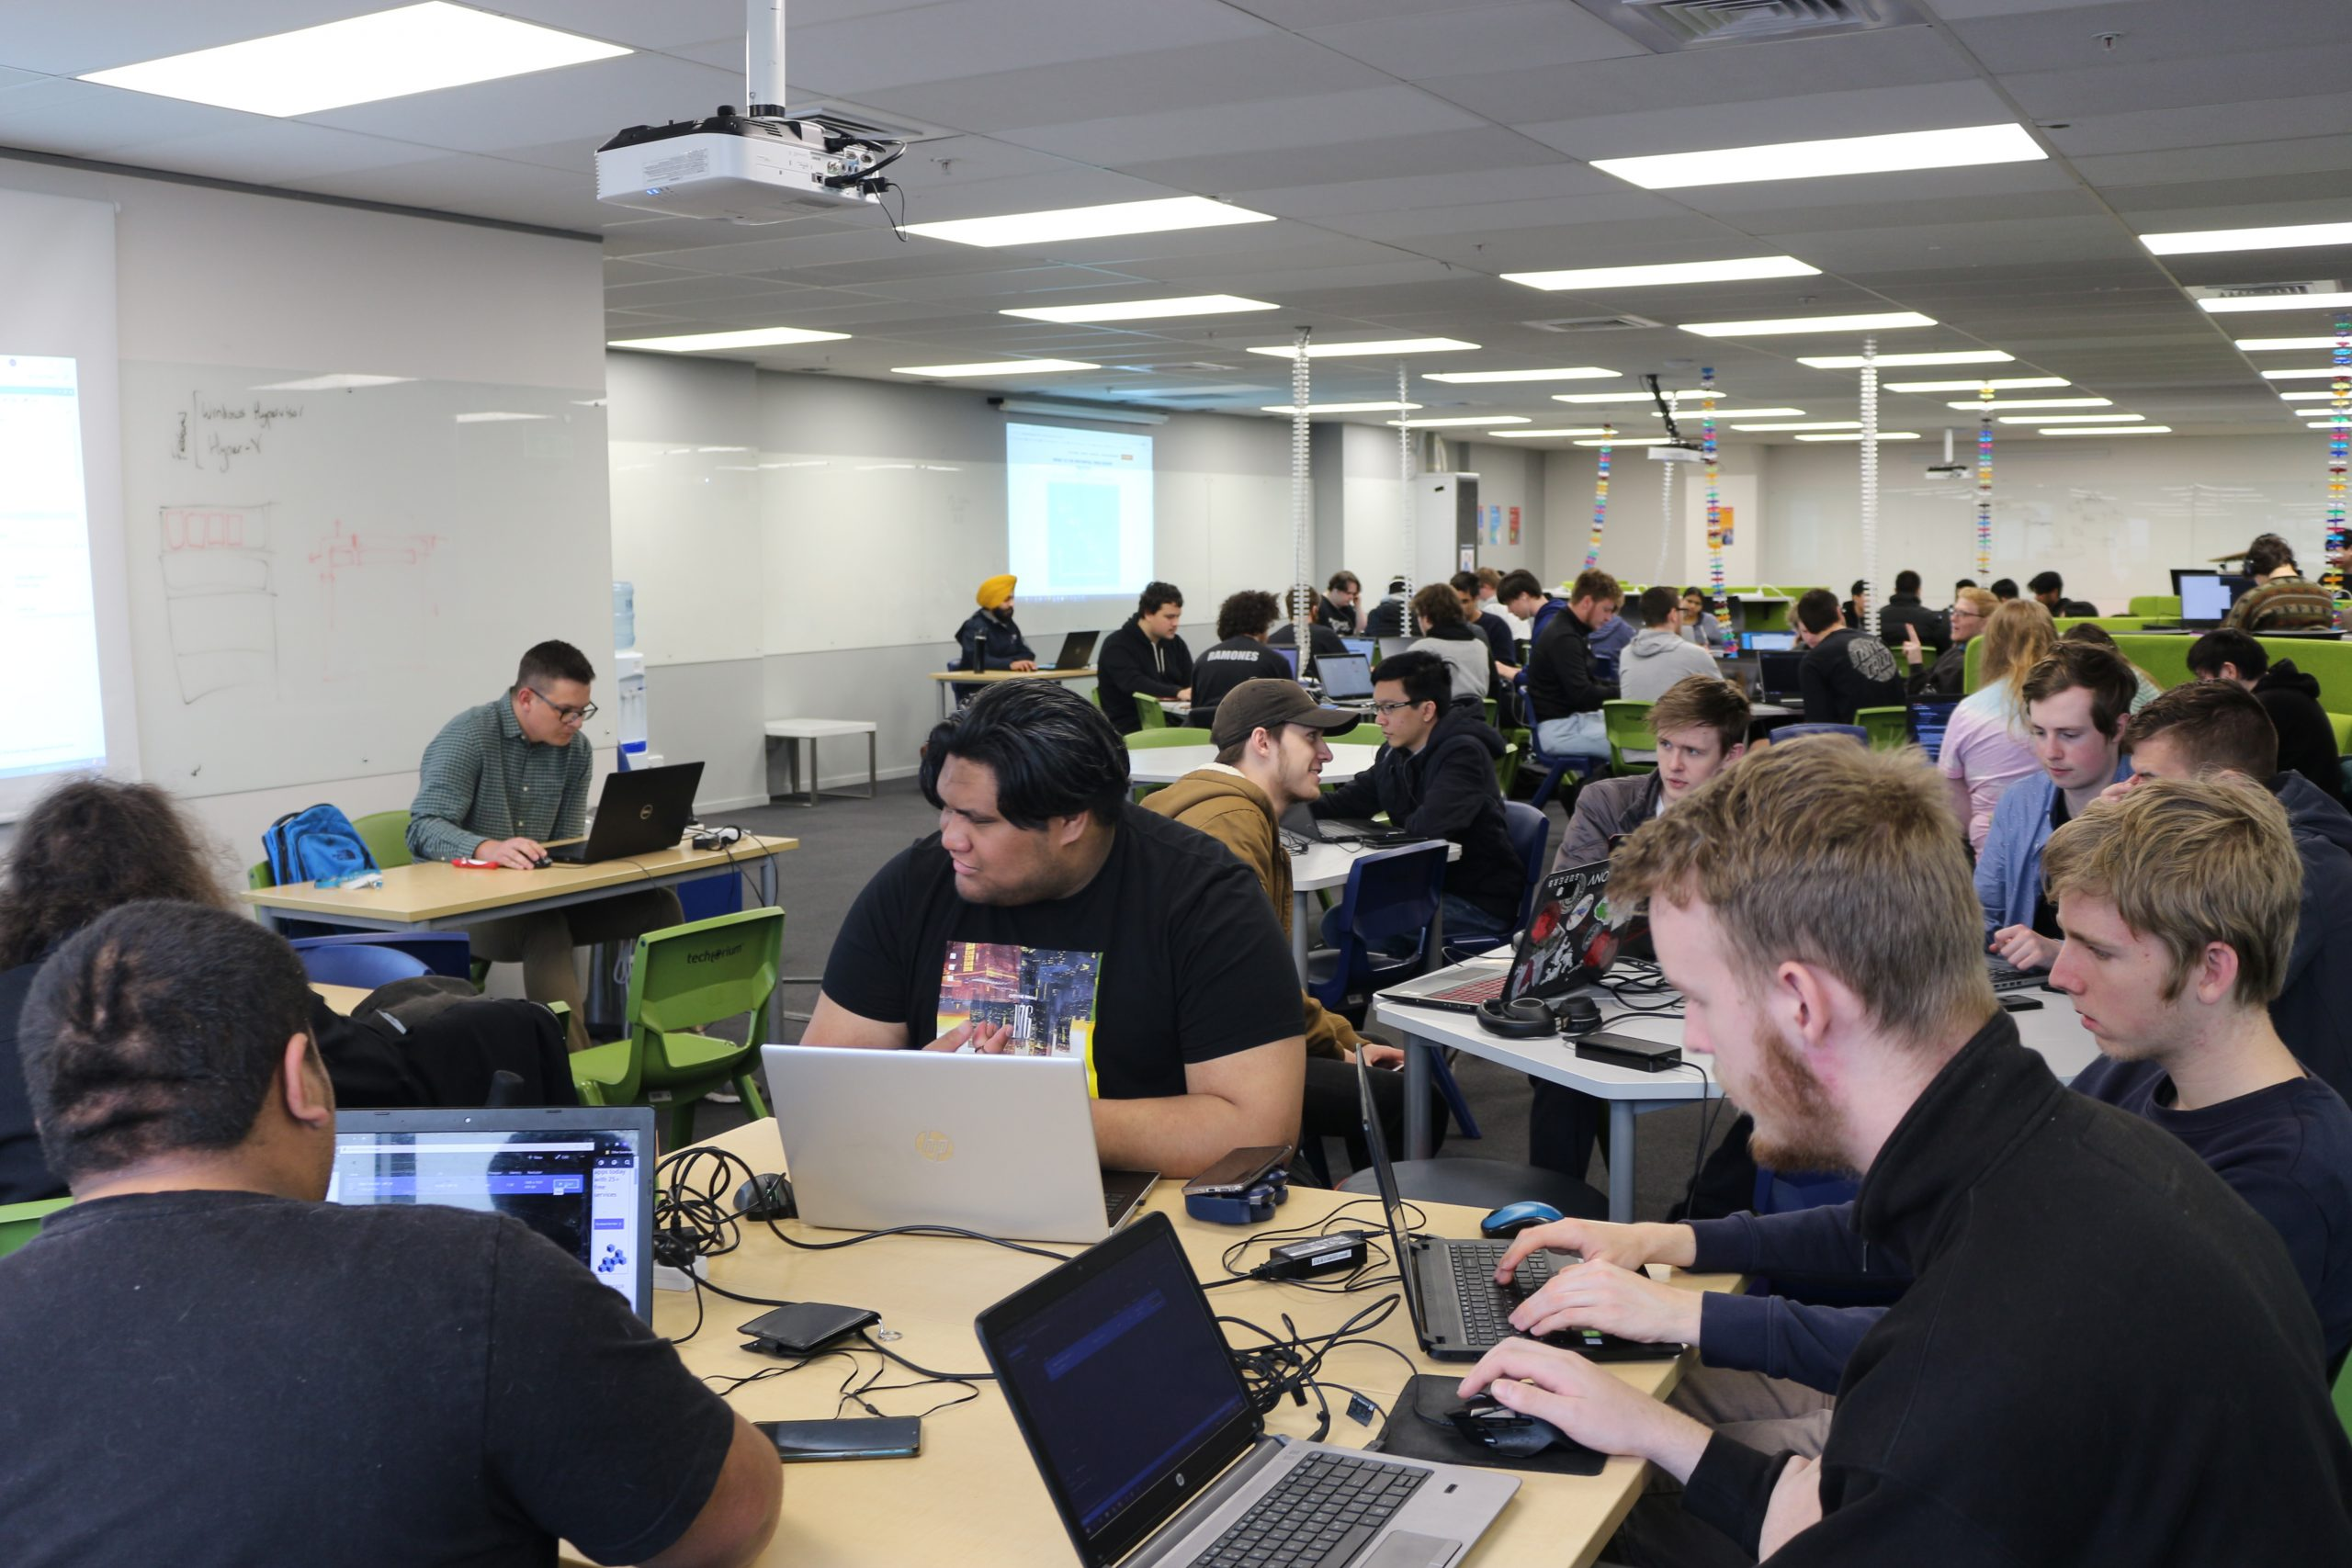 Innovative Learning Environment - Techtorium